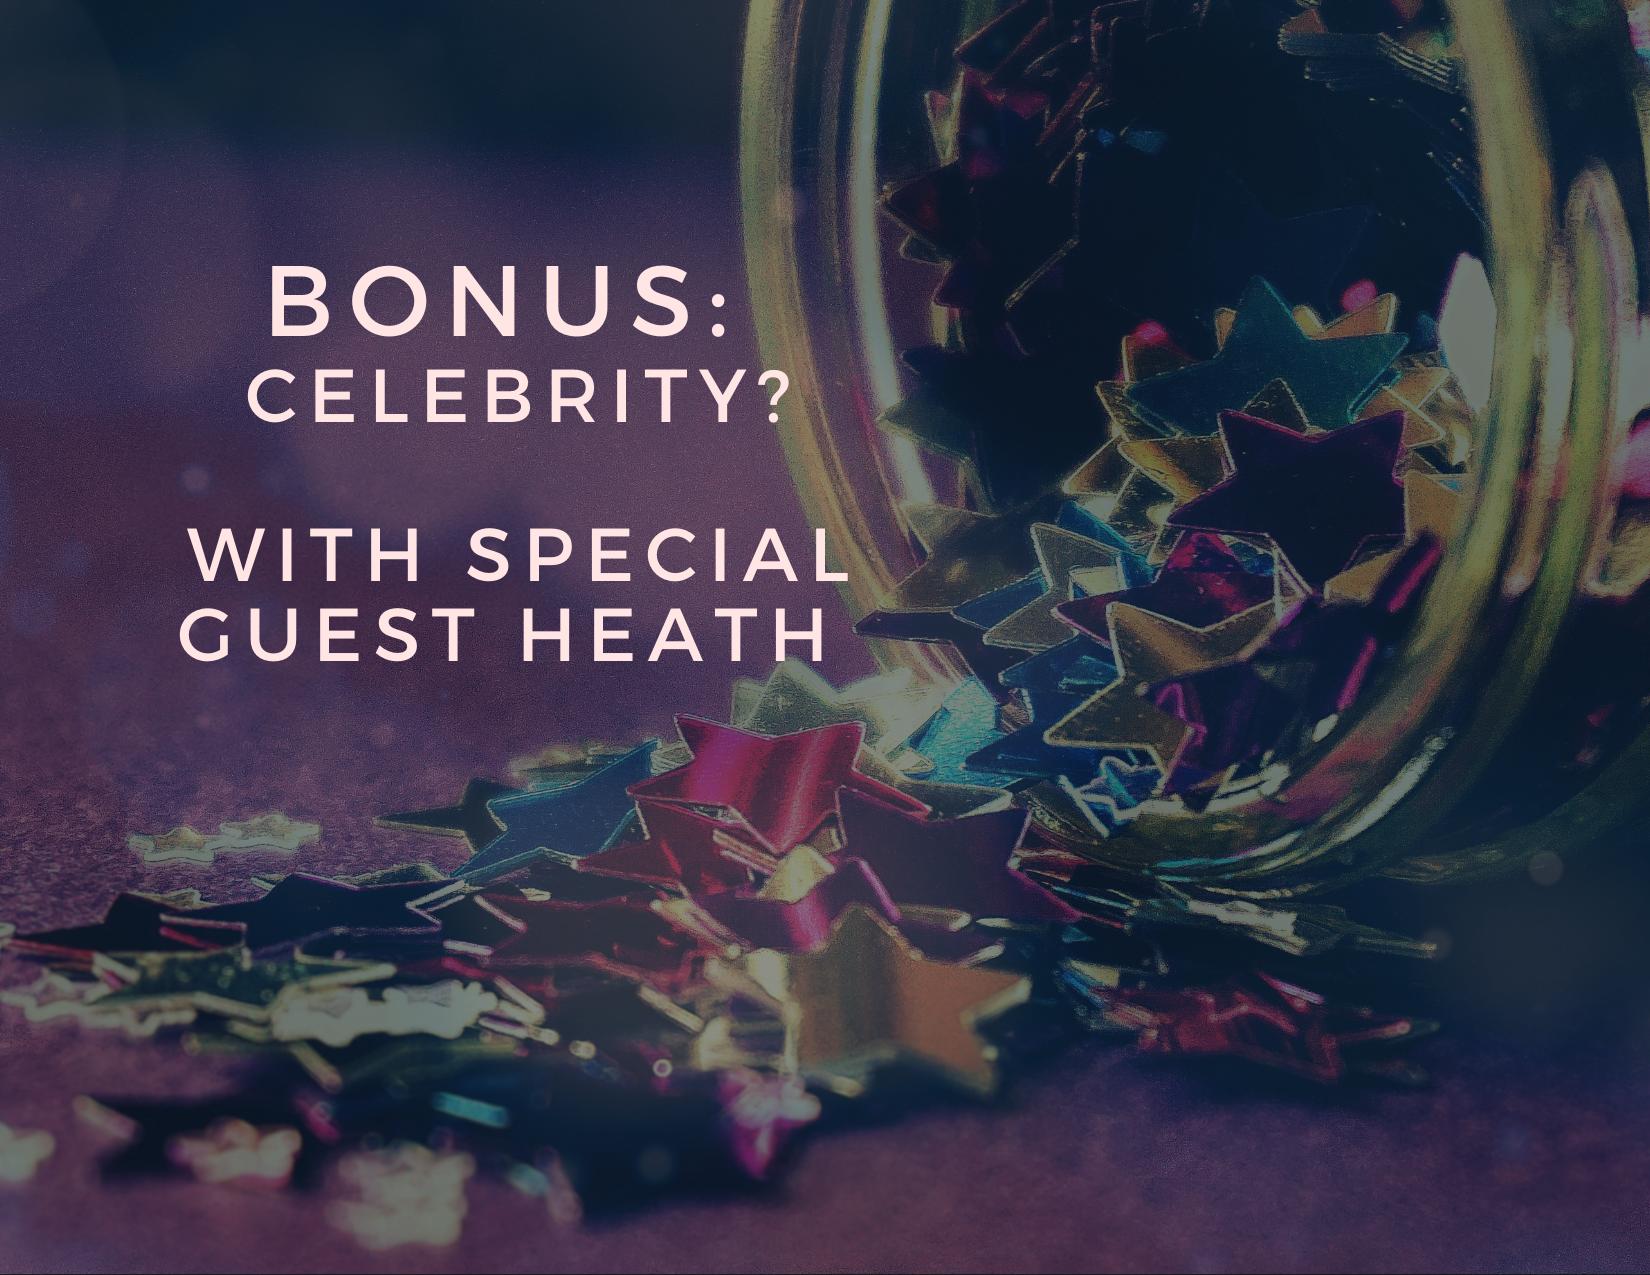 Bonus: Celebrity?